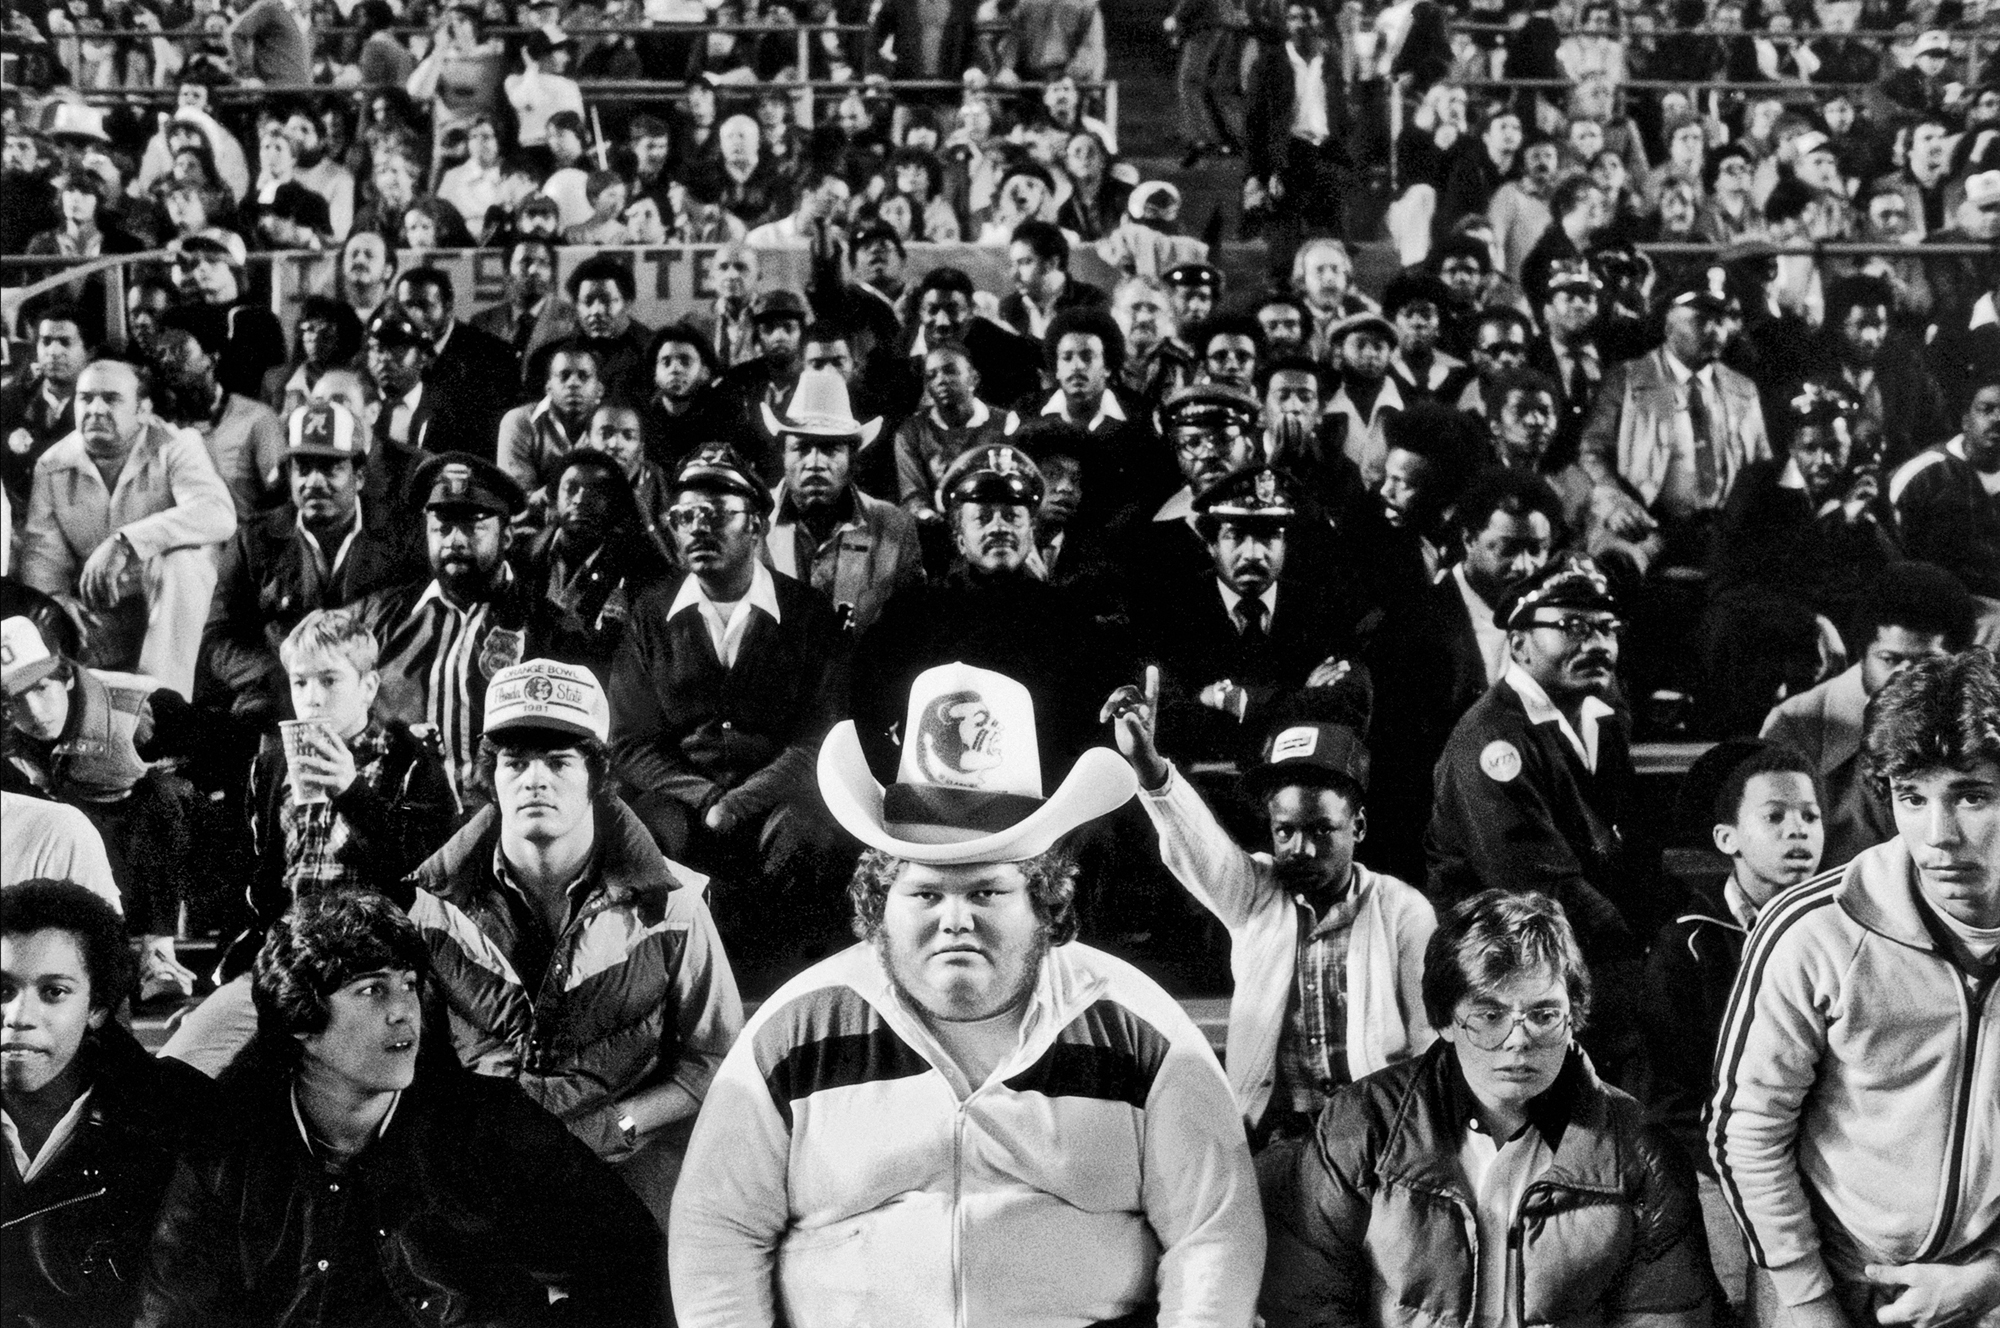 Fans at The Orange Bowl, 1981